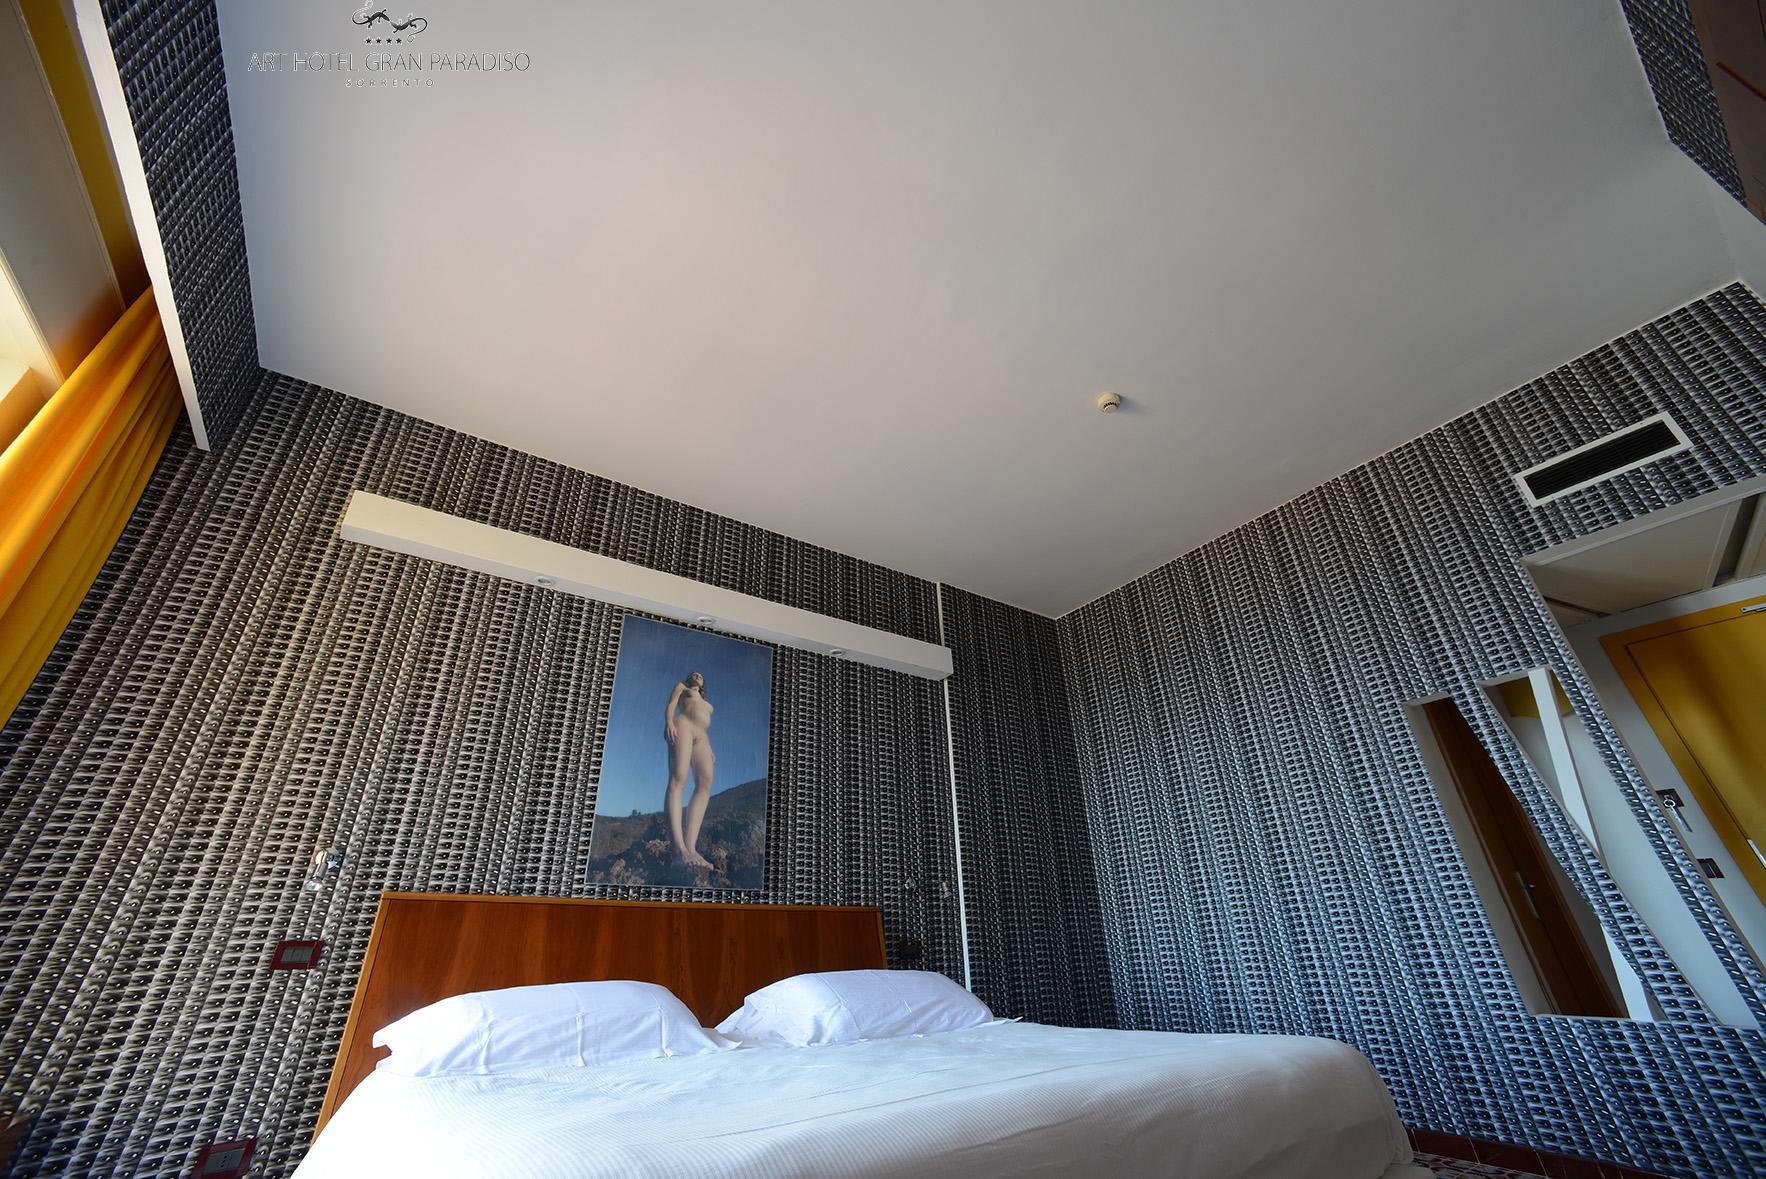 Art_Hotel_Gran_Paradiso_2013_101_Moio&Sivelli_7.jpg